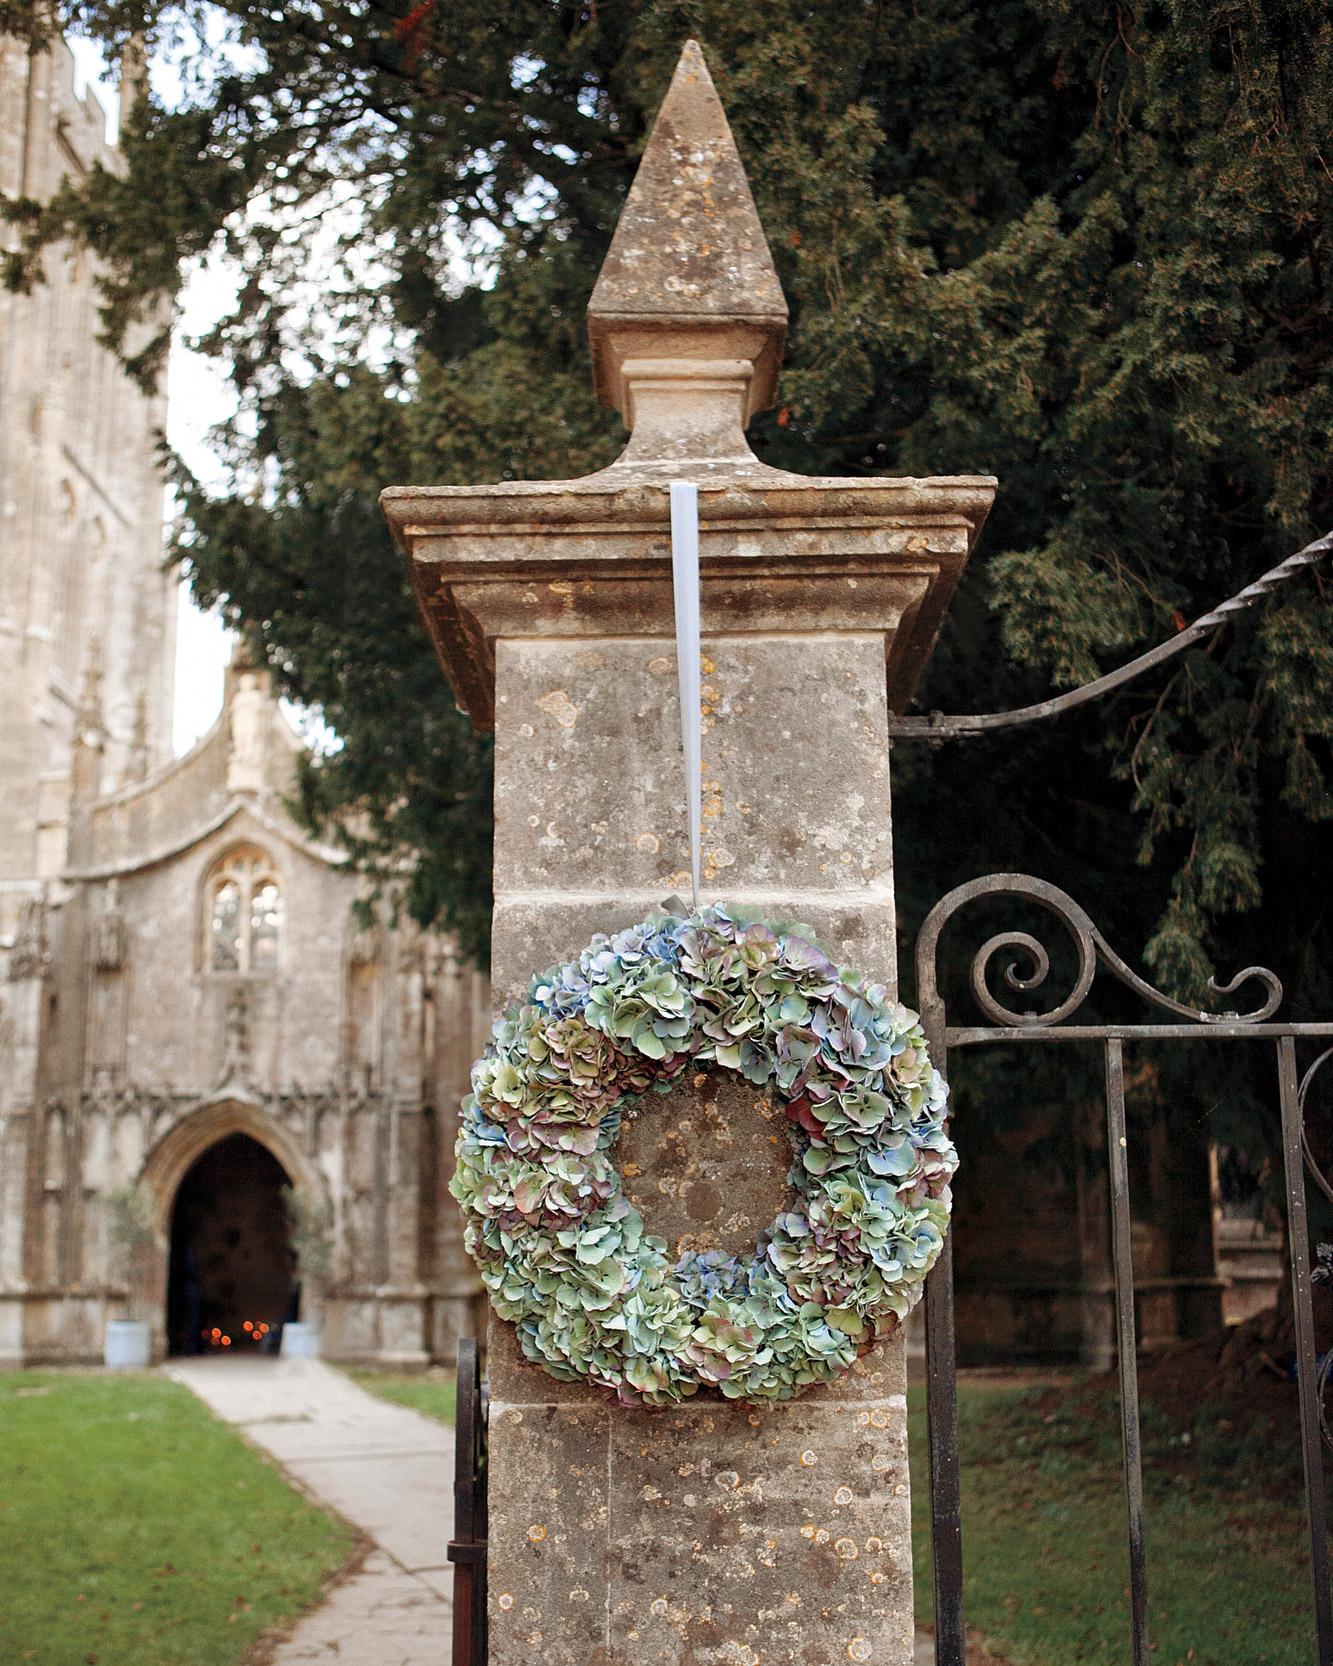 rw-heather-neal-wreath-ms107641.jpg